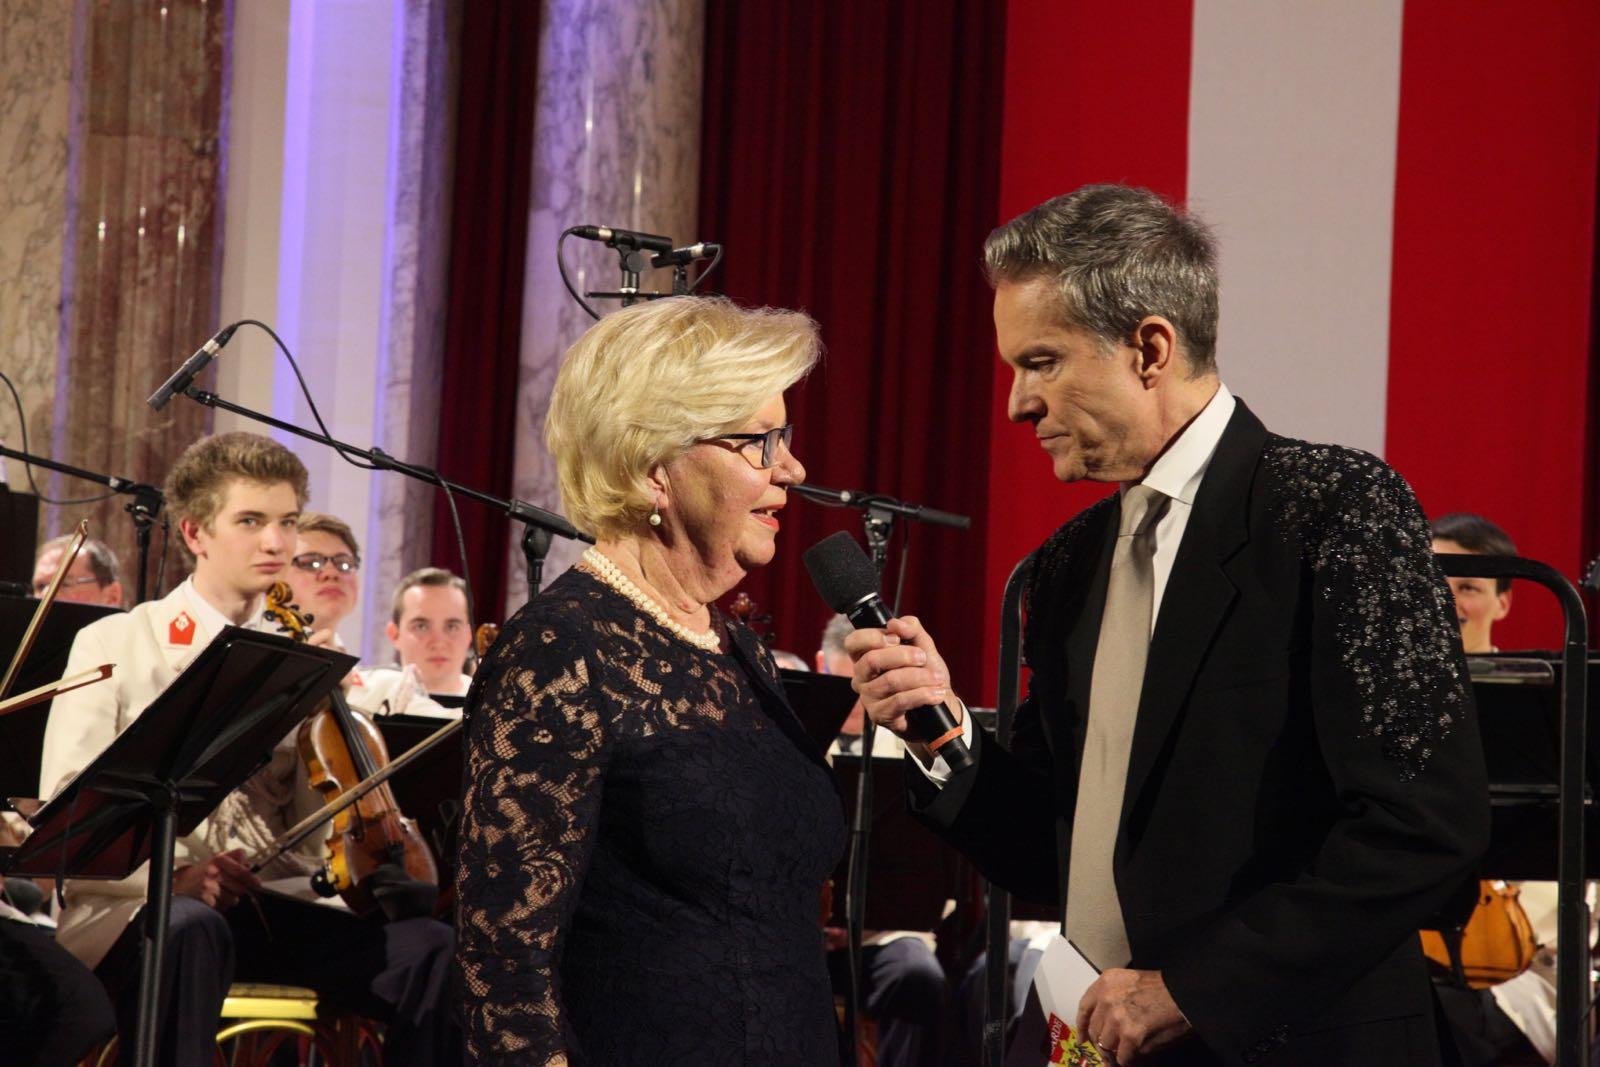 2019_03_14Gardemusik_Frühjahrskonzert_HBP_Hofburg - 69 of 177